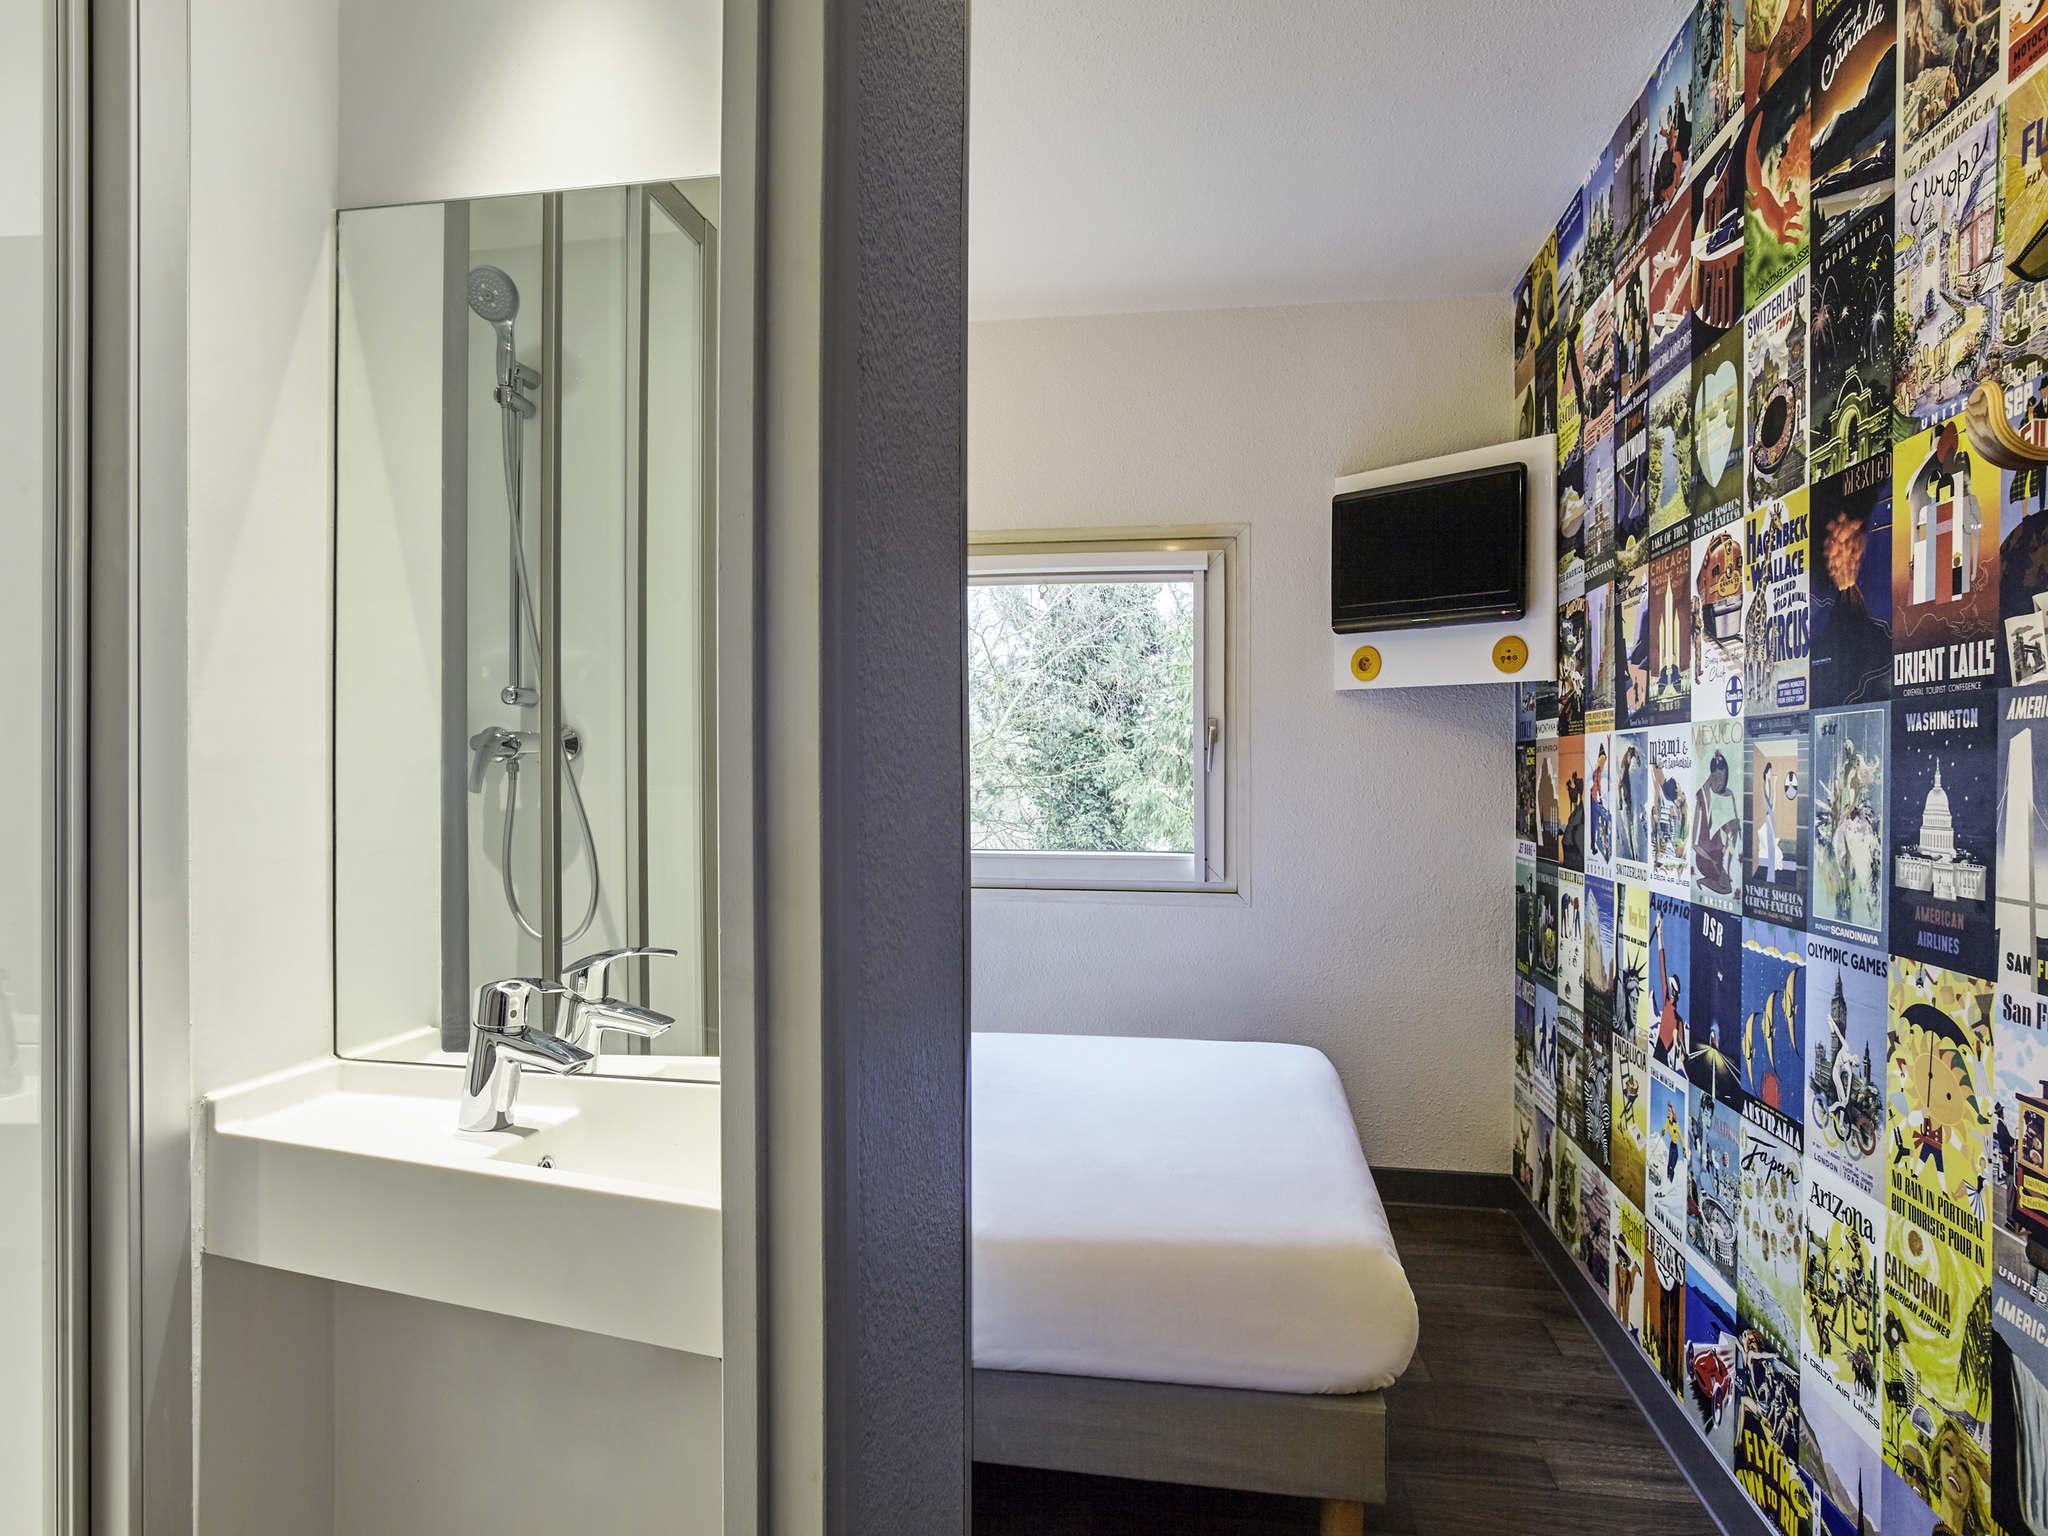 ホテル – hotelF1 Marseille Plan de Campagne N°1 (rénové)